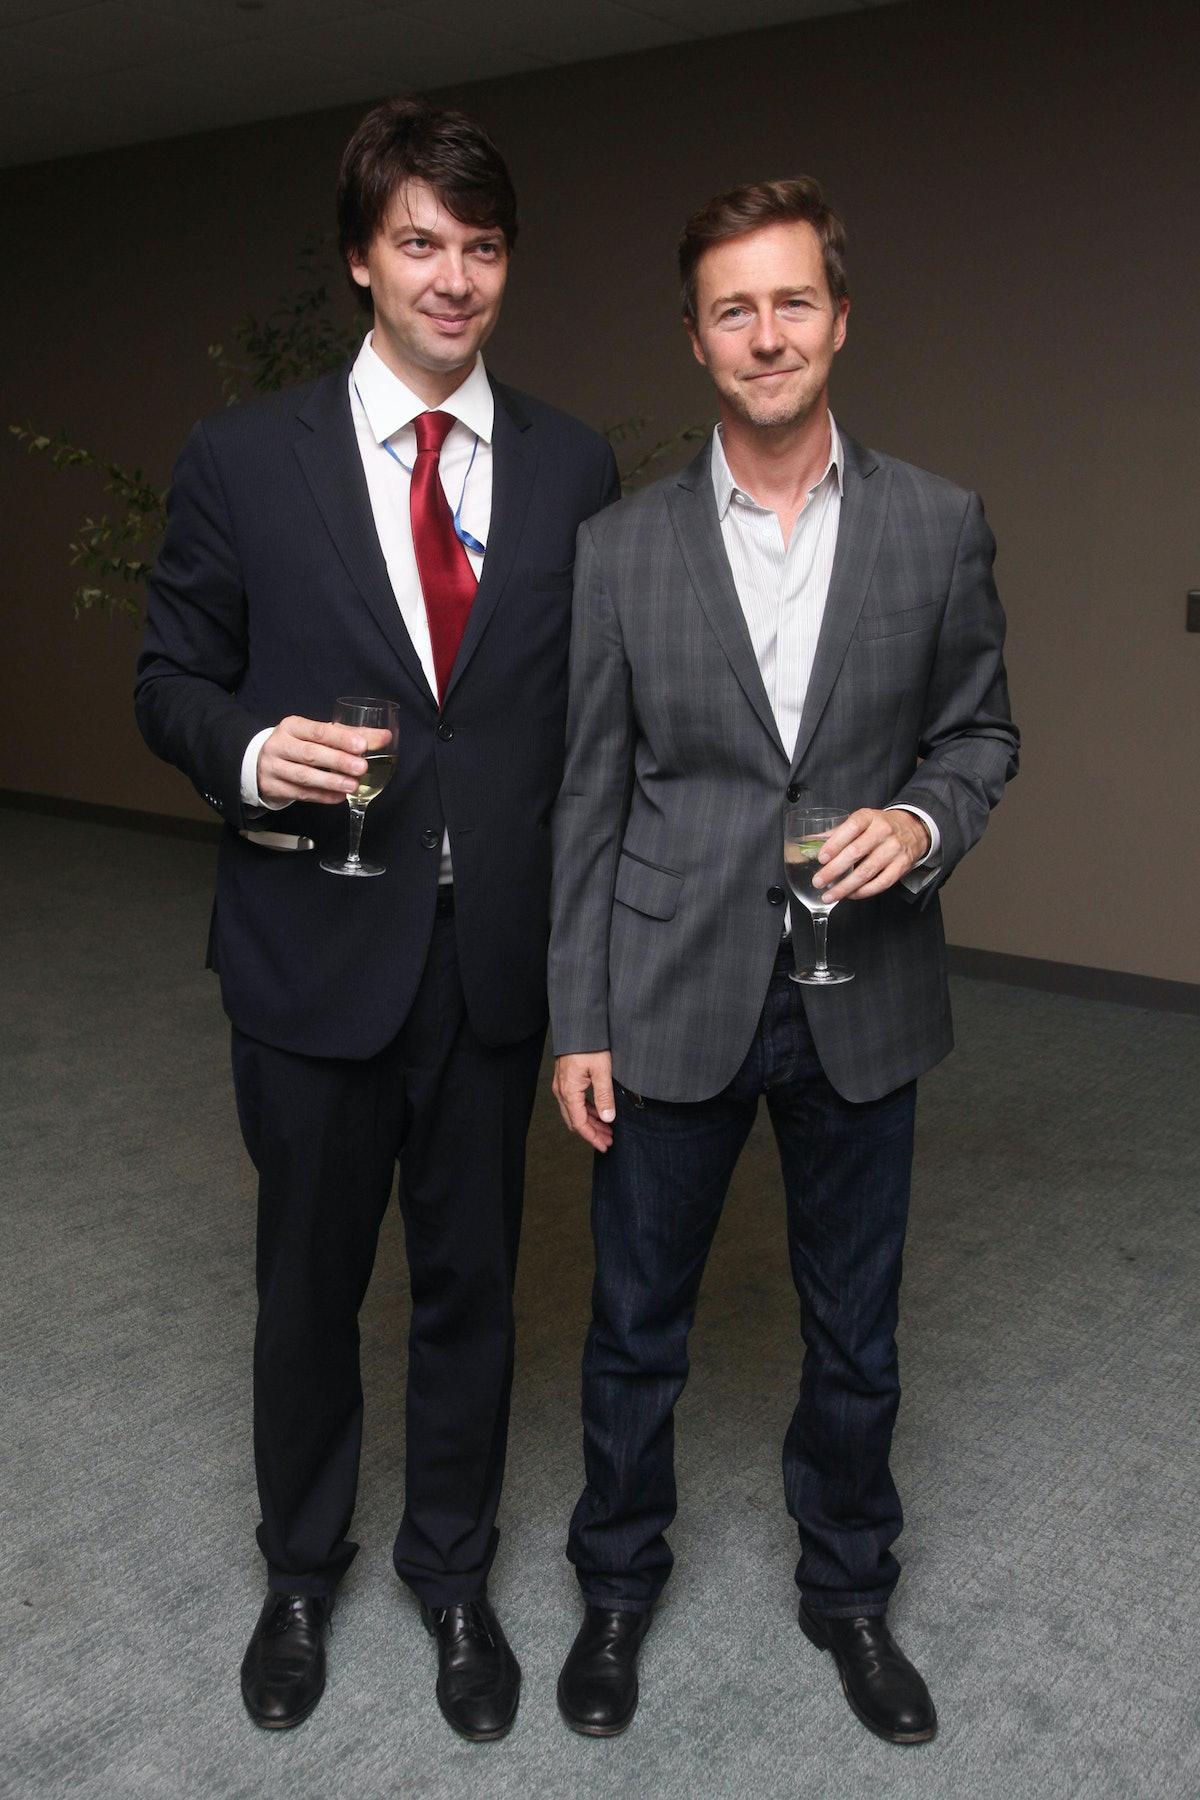 Edward Norton (right)